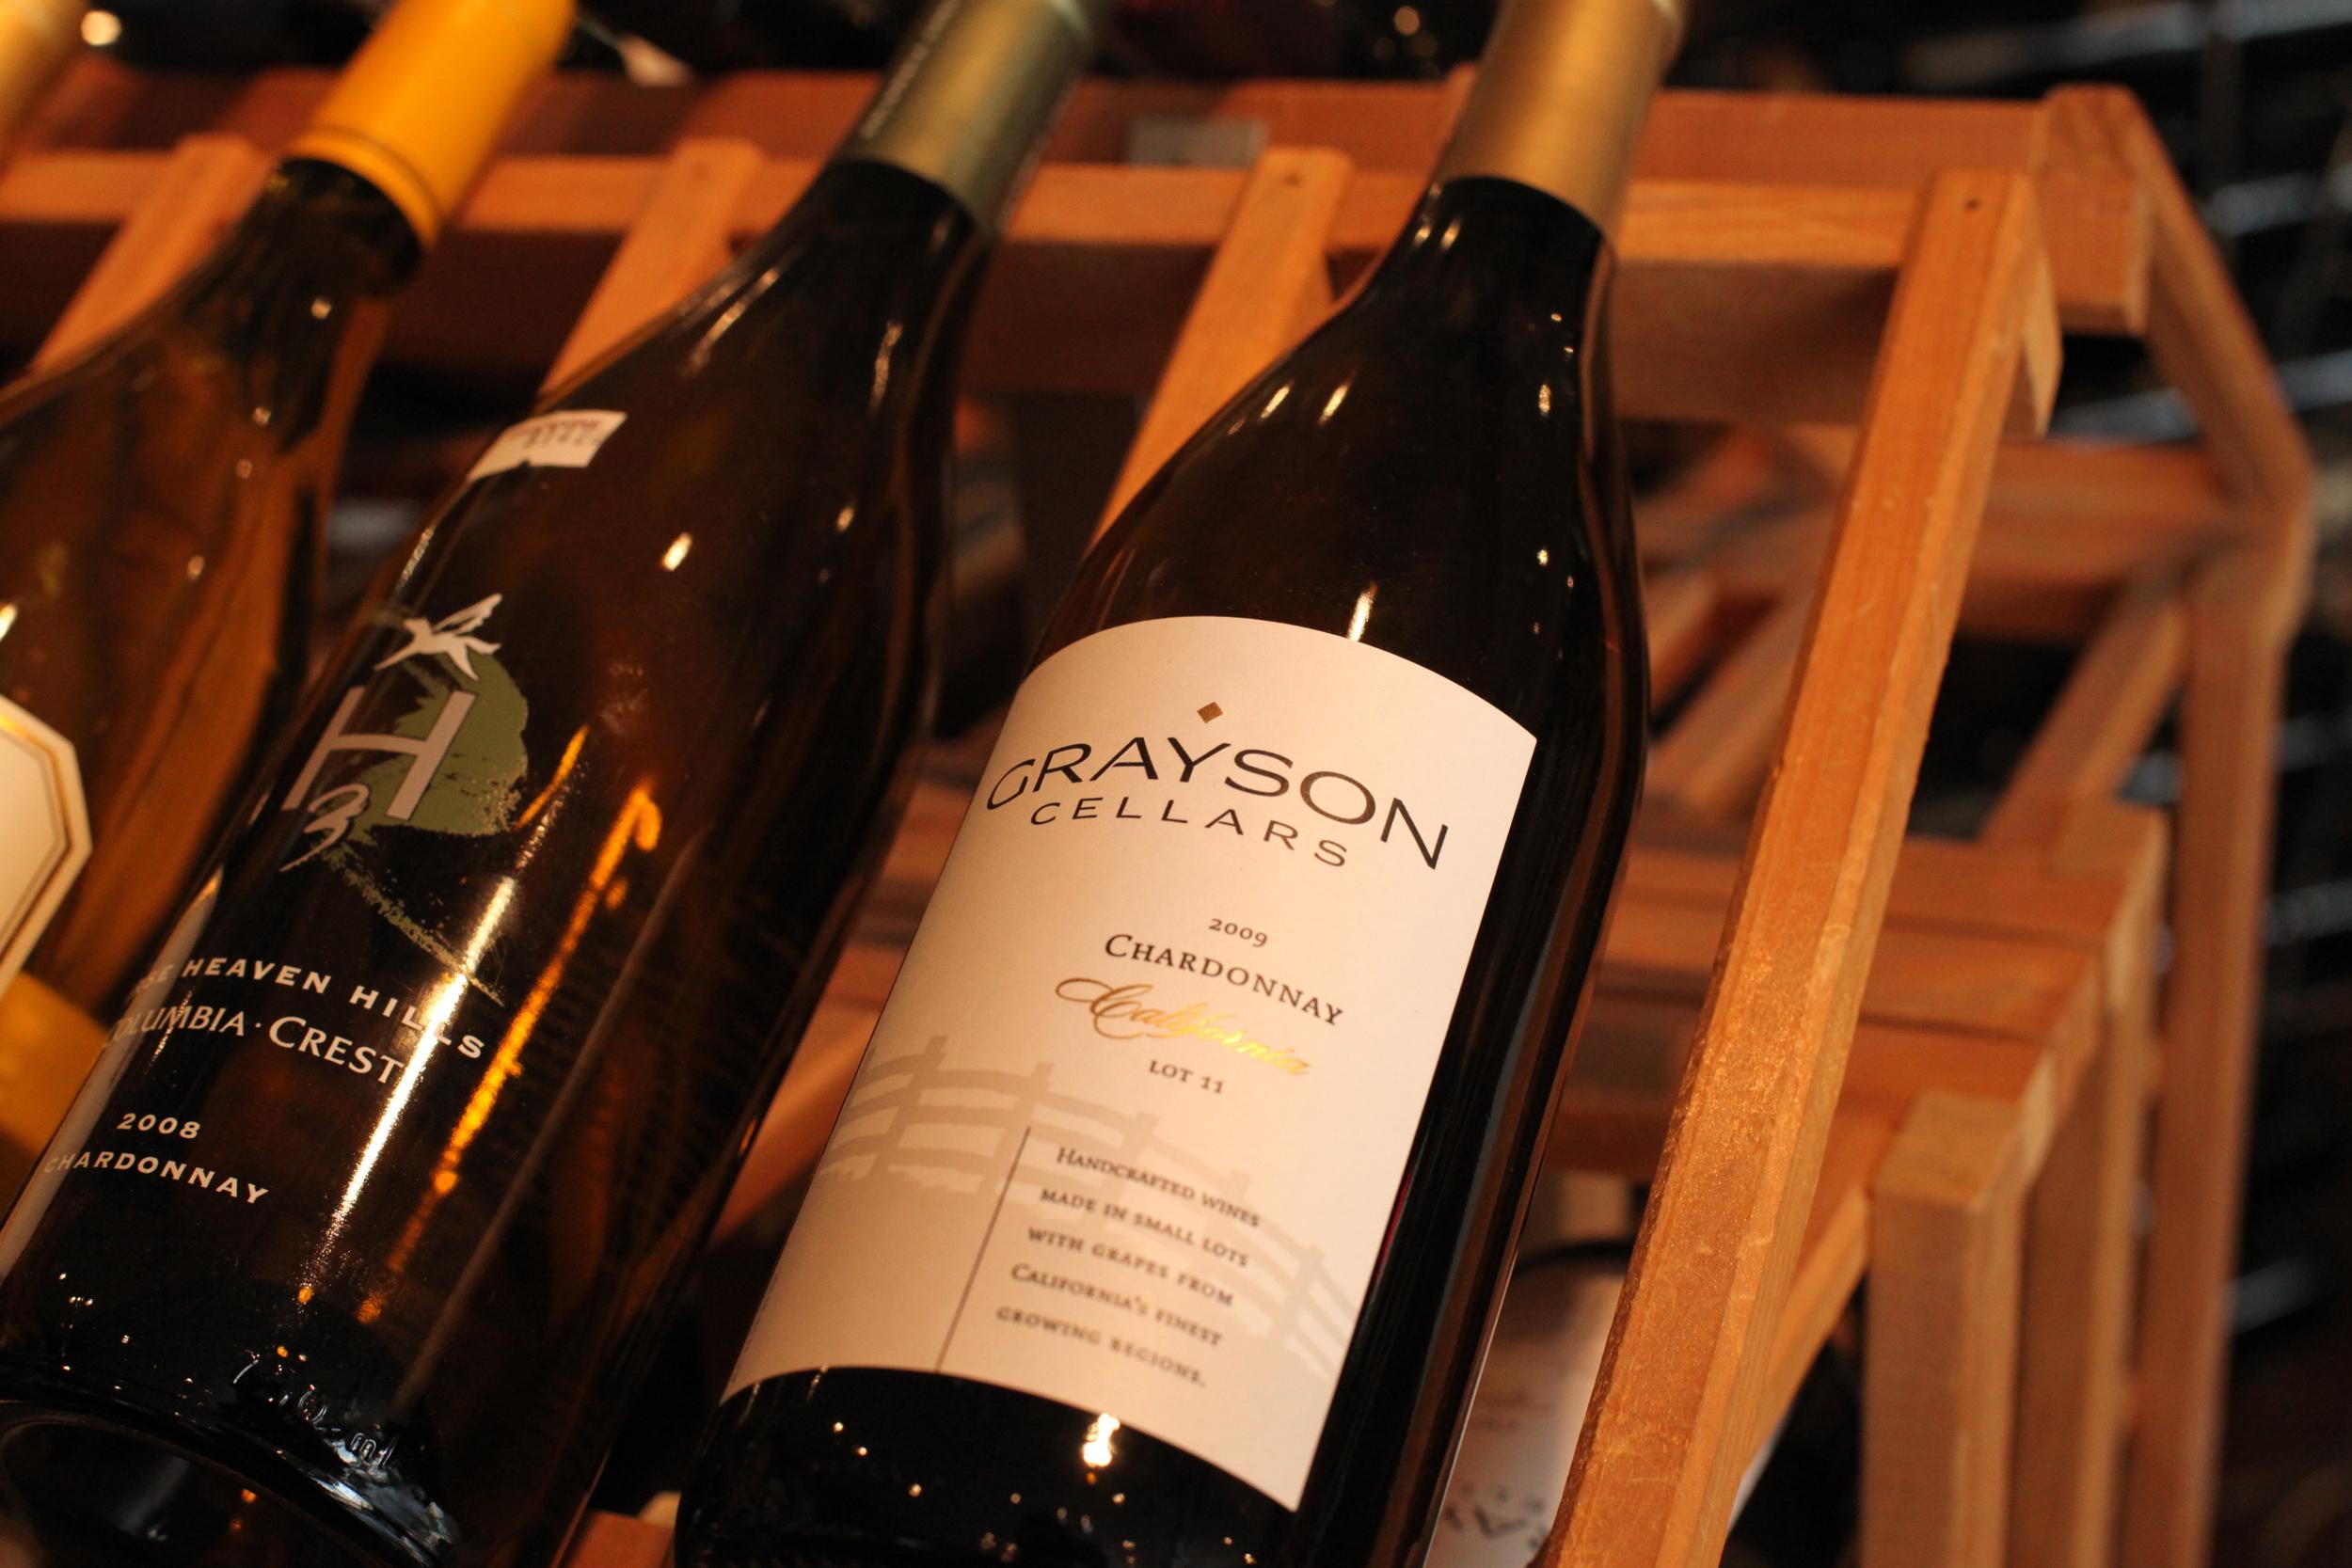 Grayson11.jpg